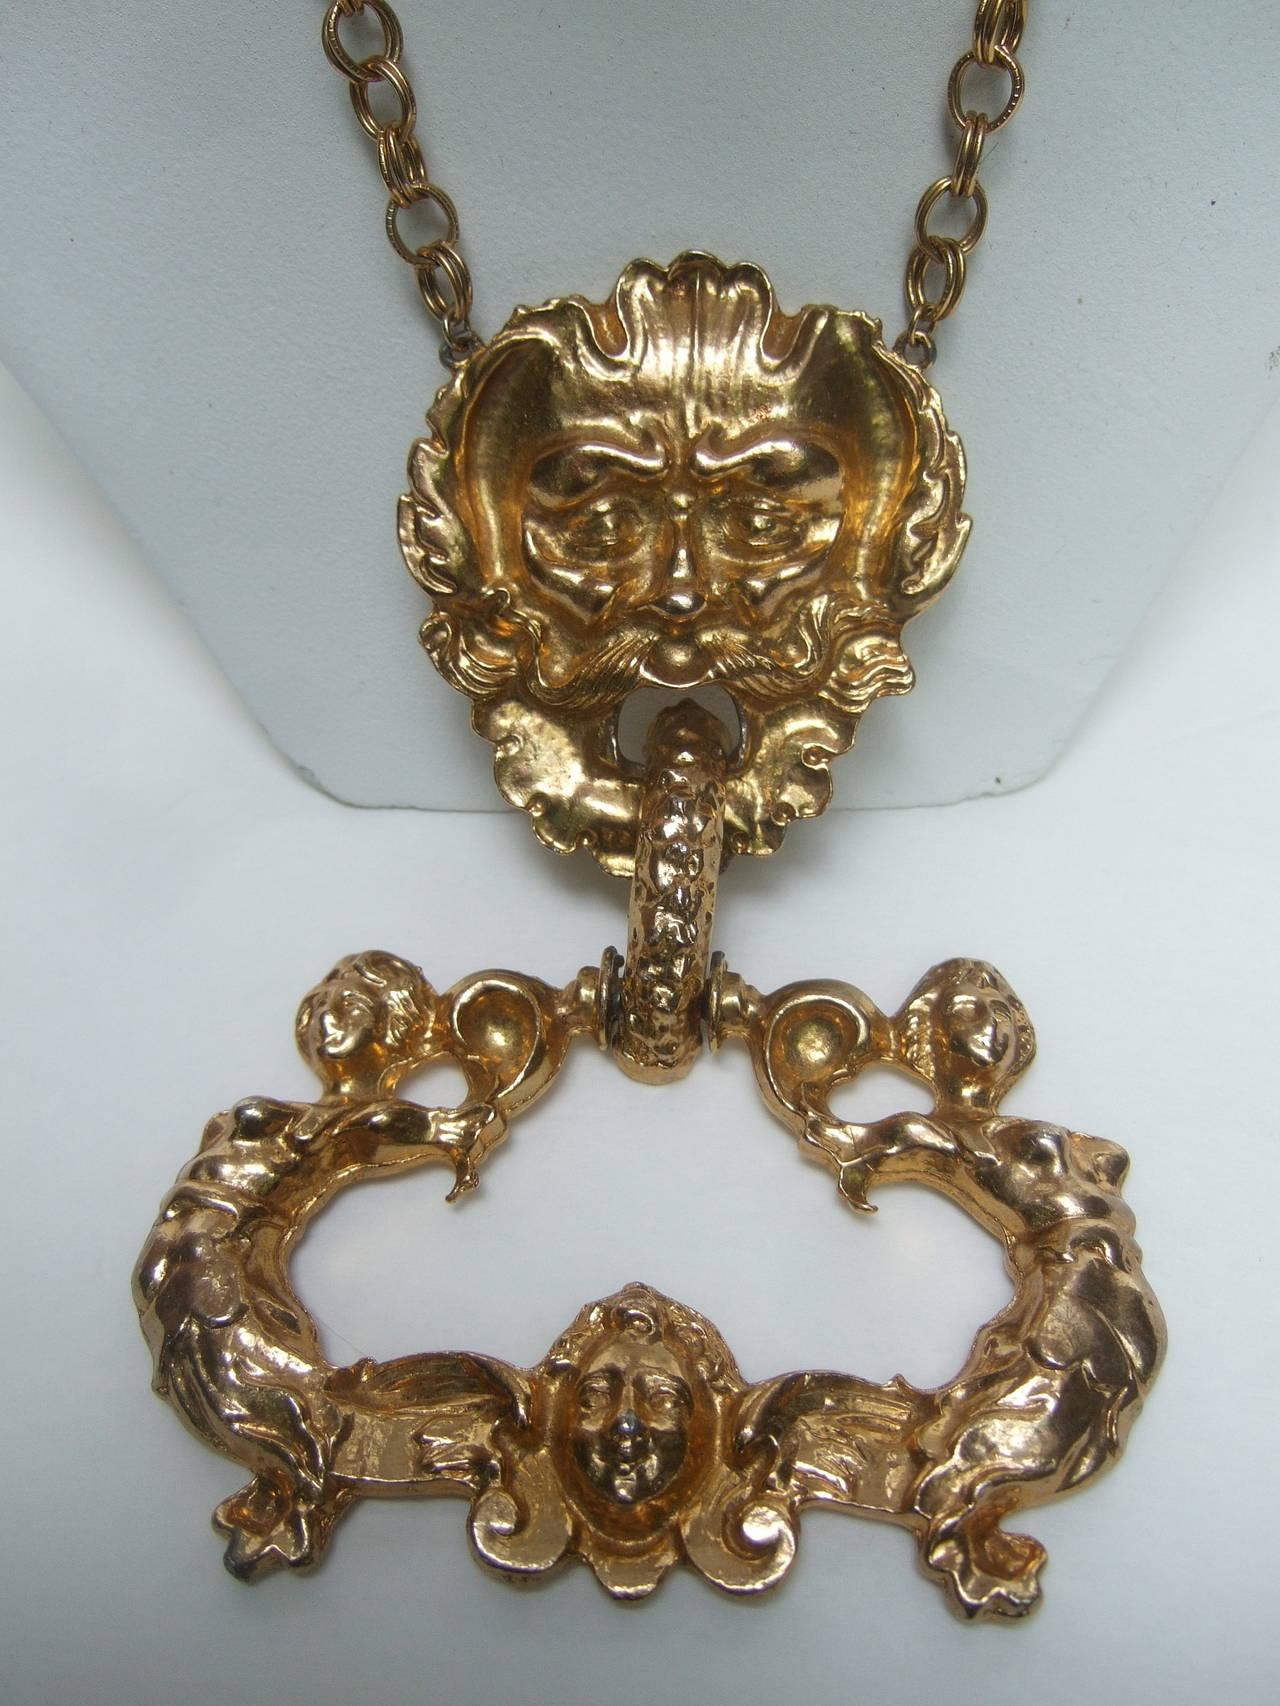 Massive Gilt Metal Figural Pendant Necklace c 1970 In Excellent Condition For Sale In Santa Barbara, CA